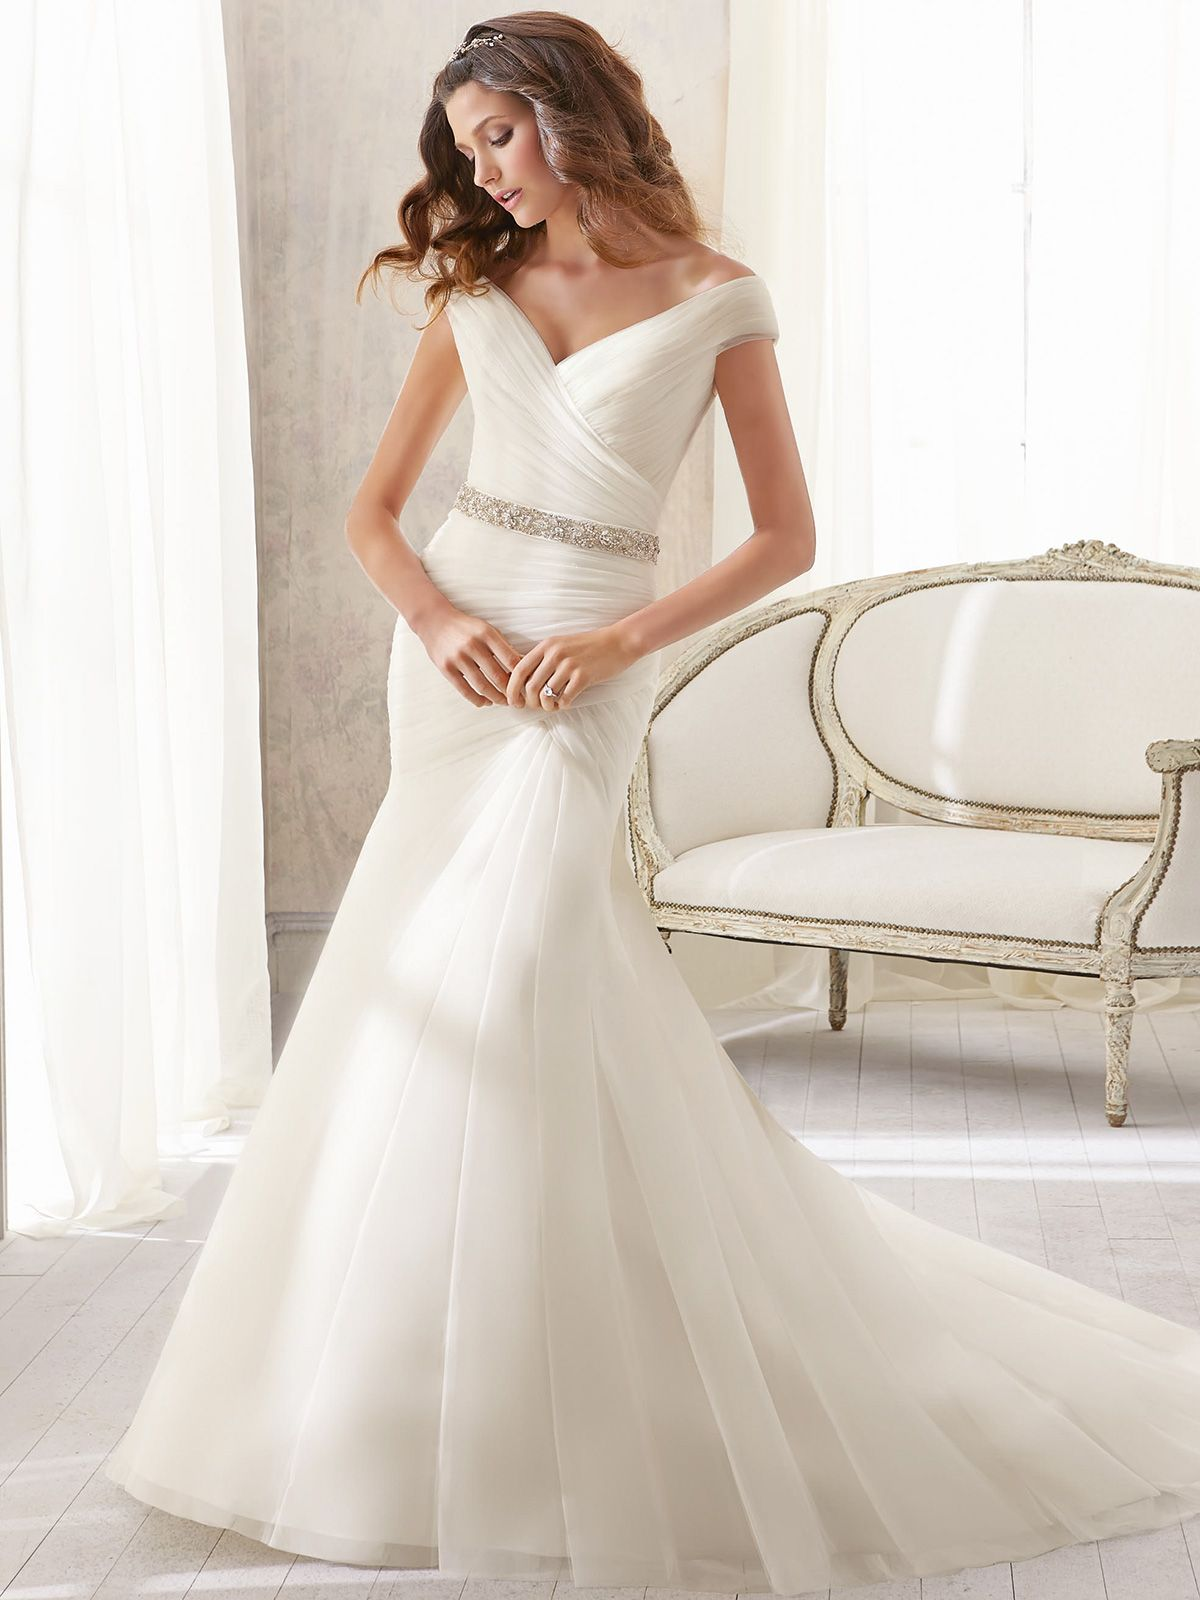 Mori Lee blu Bridal Dress 5210: DimitraDesigns.com | wedding ...